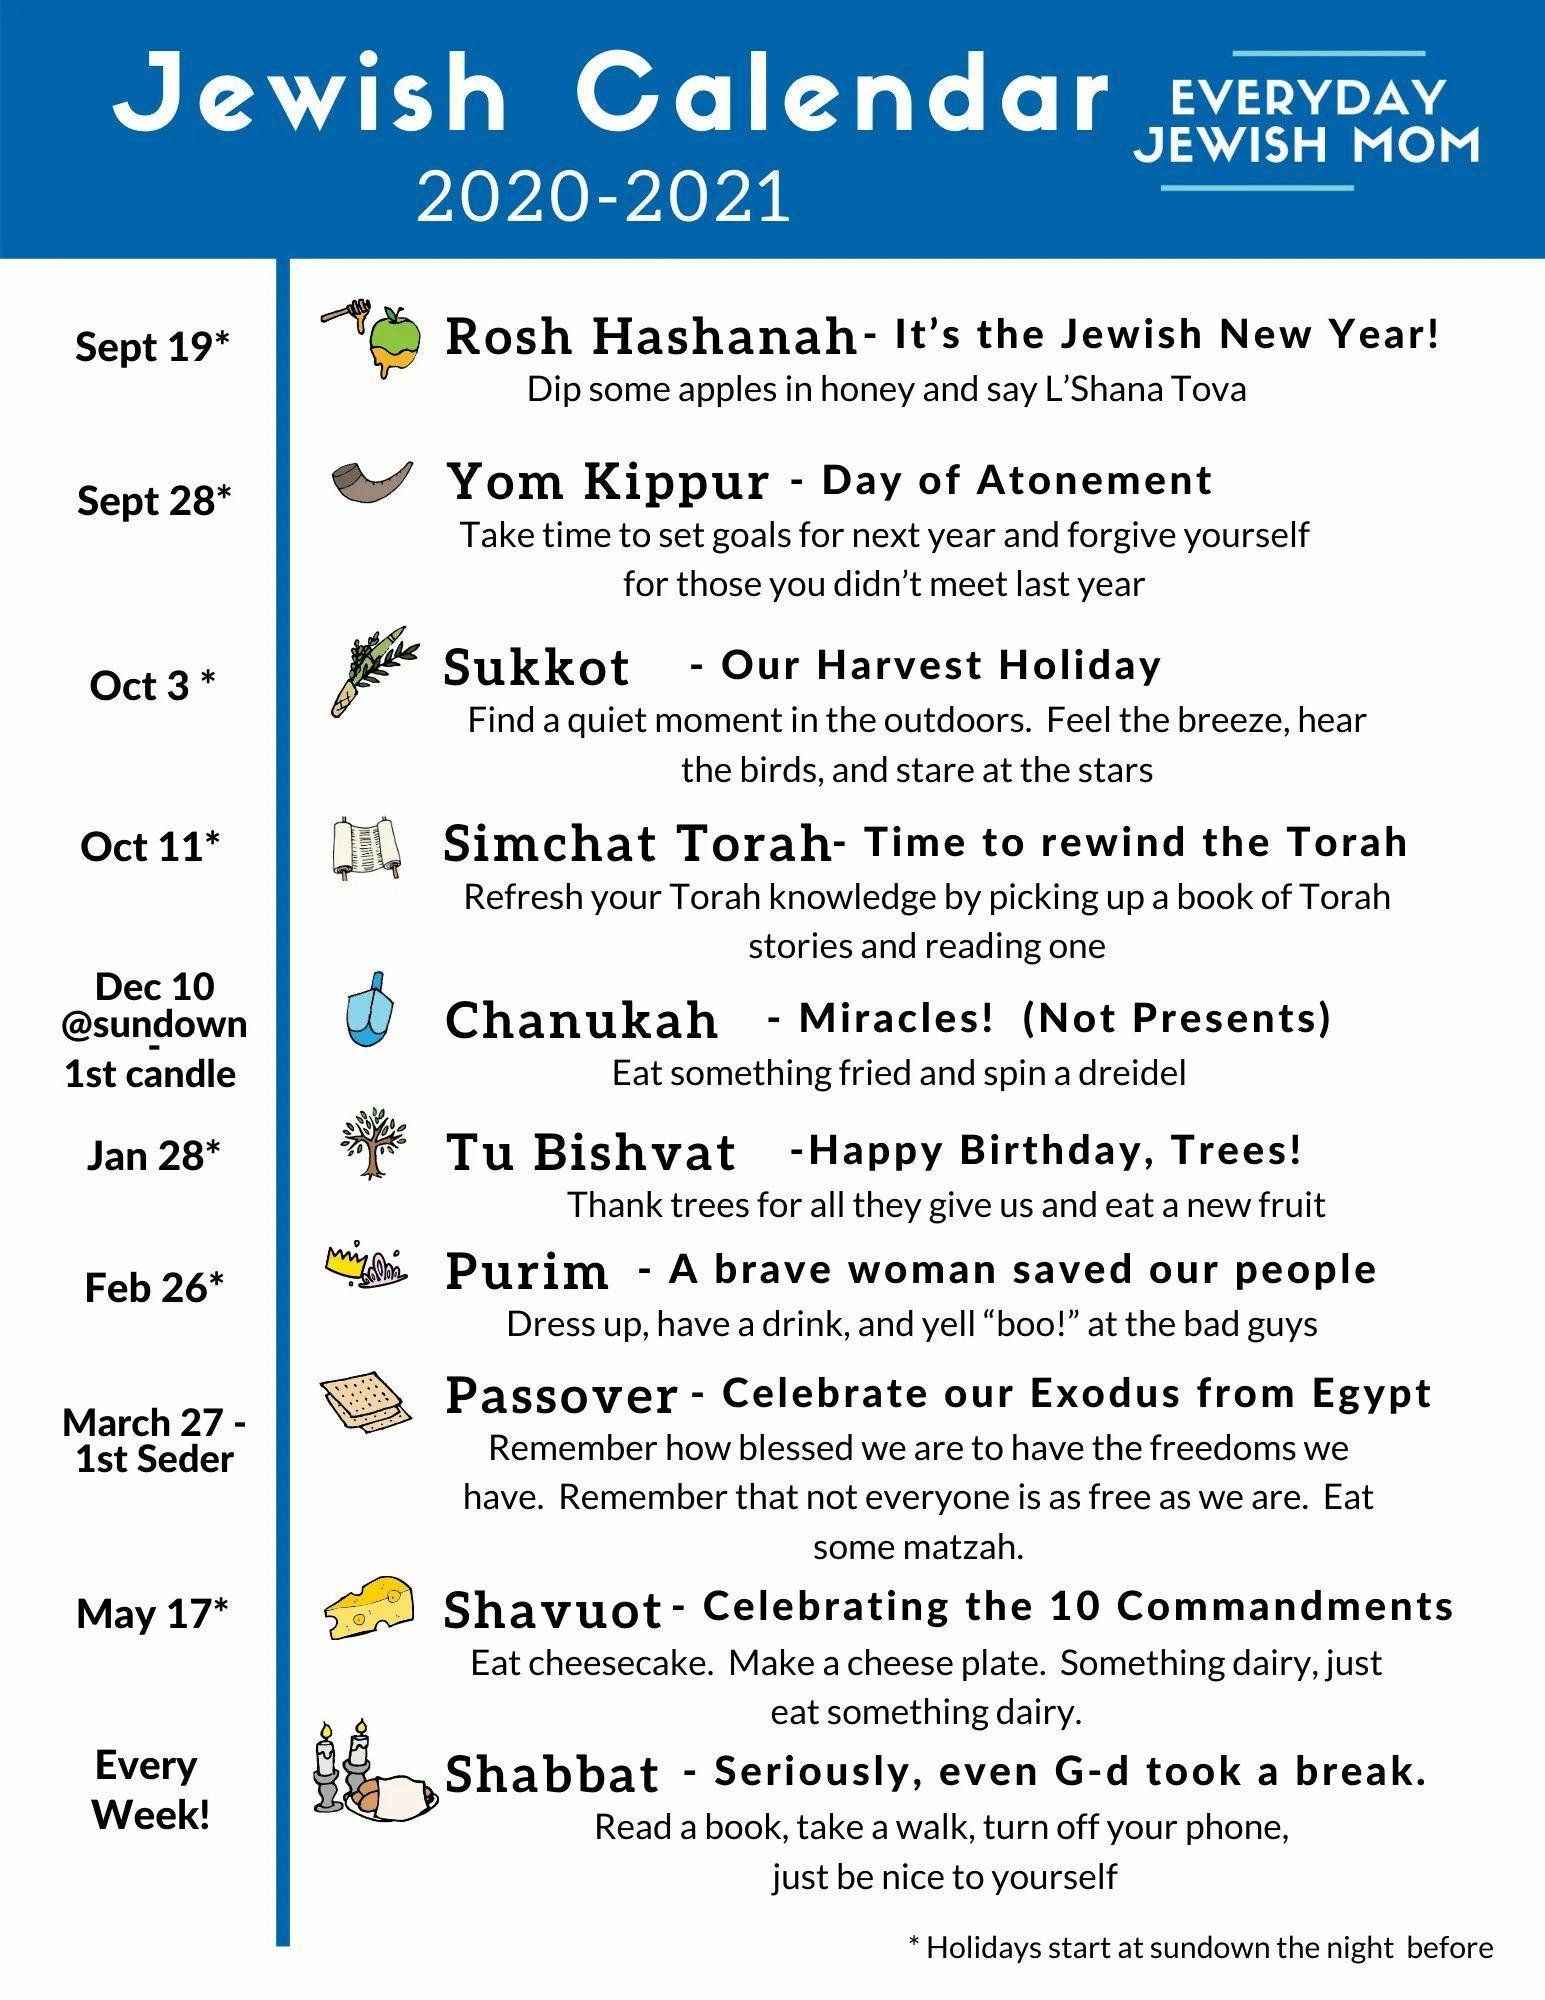 Jewish Calendar 2020 2021 Free Download Everyday Jewish Mom Jewish Calendar Jewish Beliefs Jewish Moms